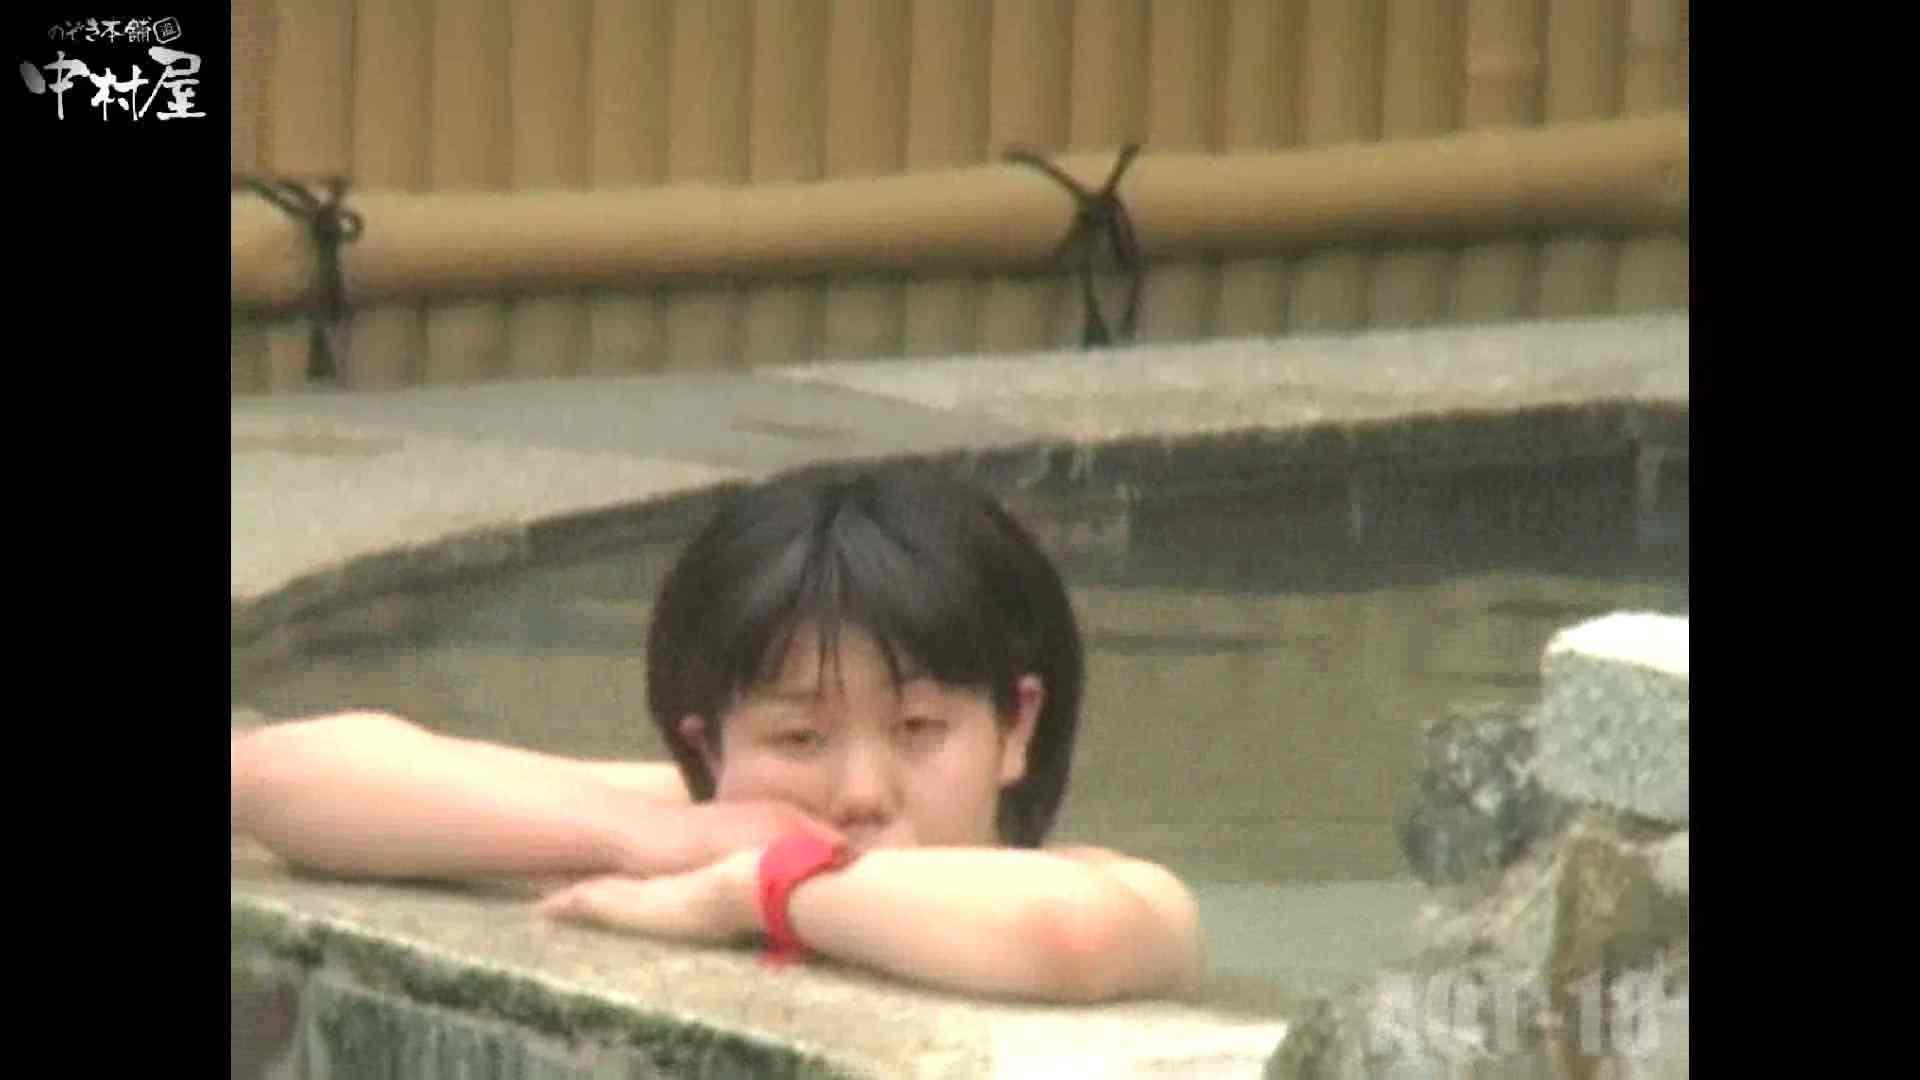 Aquaな露天風呂Vol.882潜入盗撮露天風呂十八判湯 其の七 盗撮 | 潜入  113連発 61